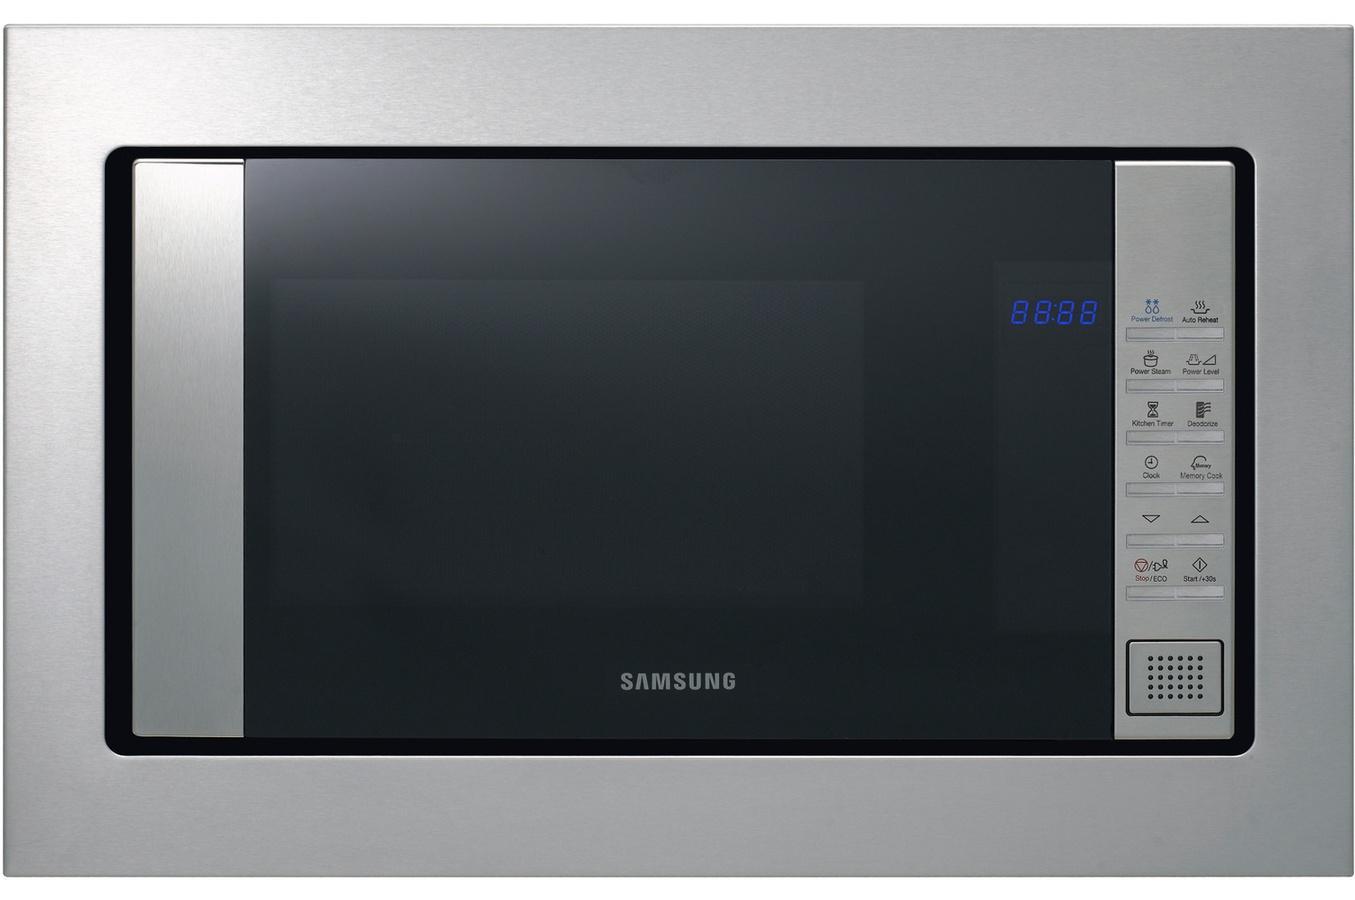 Photo Micro Ondes Encastrable Samsung FW77SUST